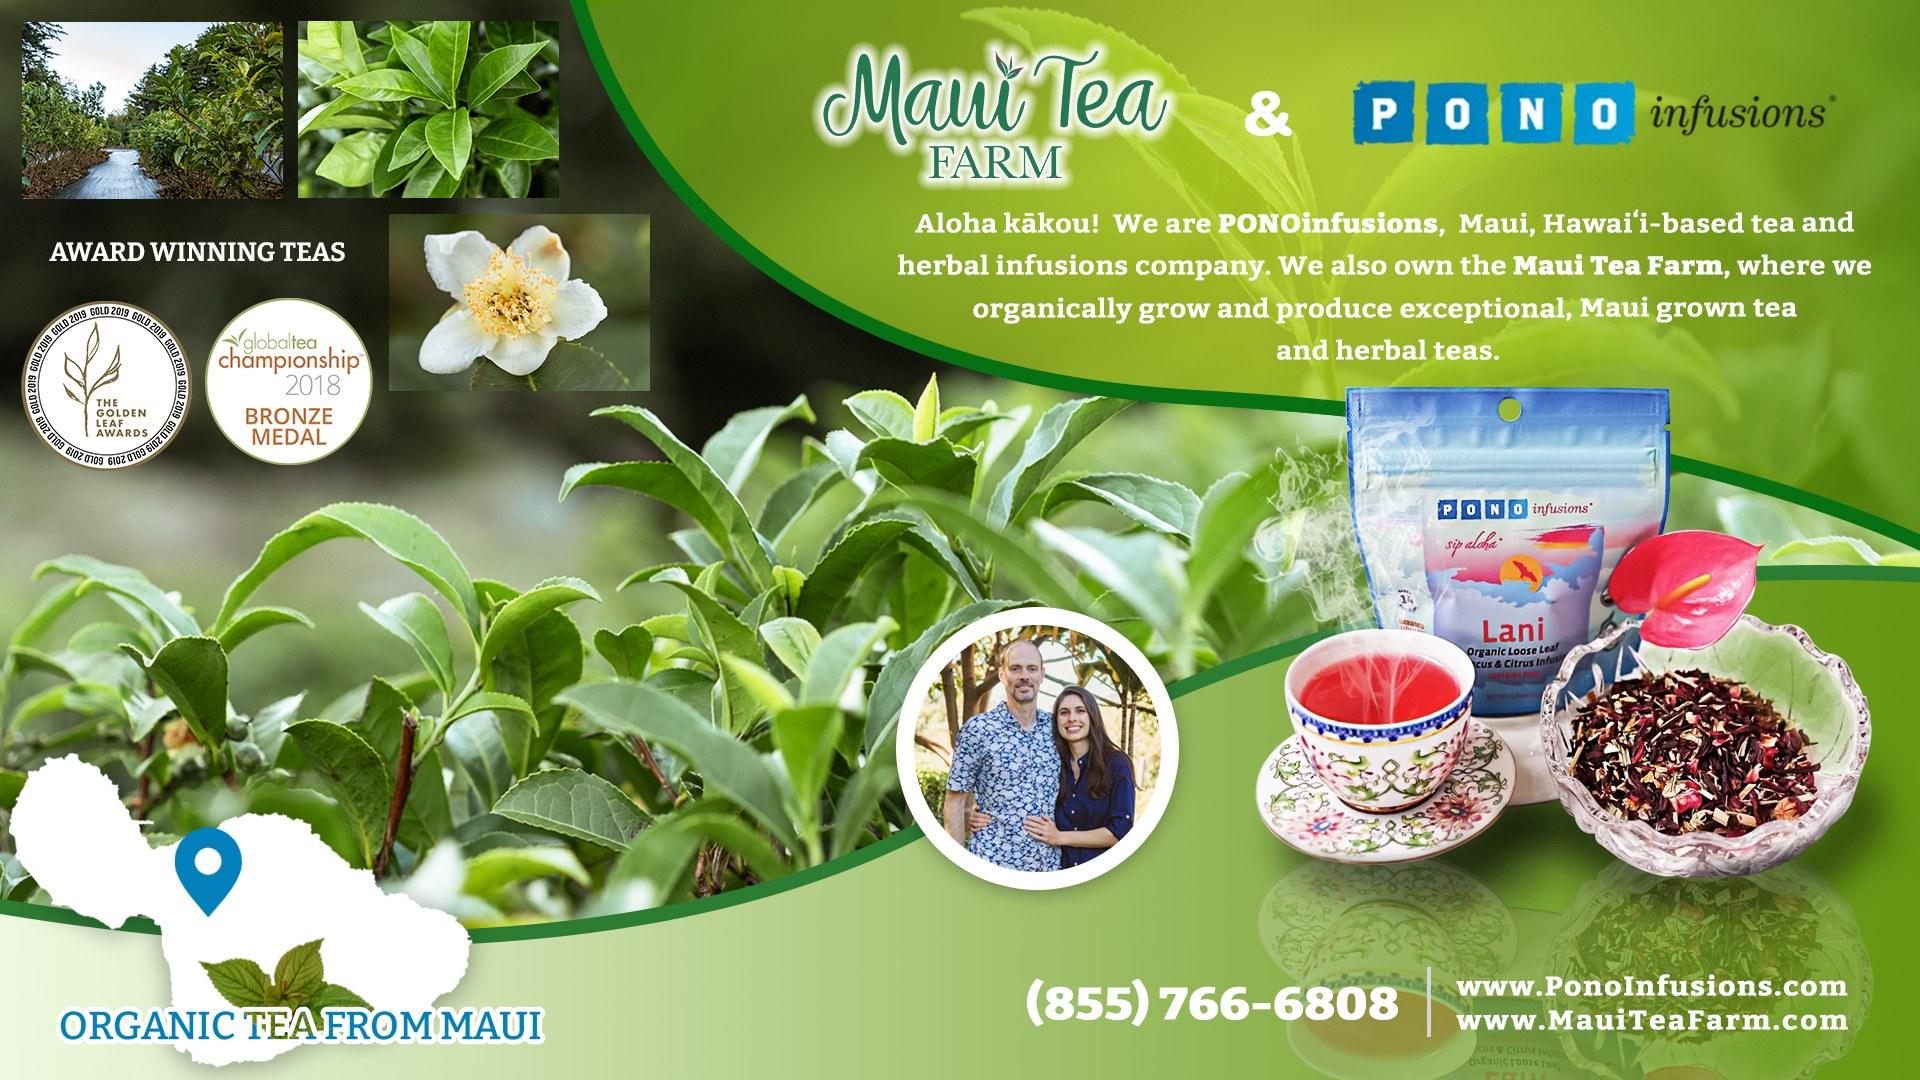 Maui Tea Farm Pono Infusions Graphic